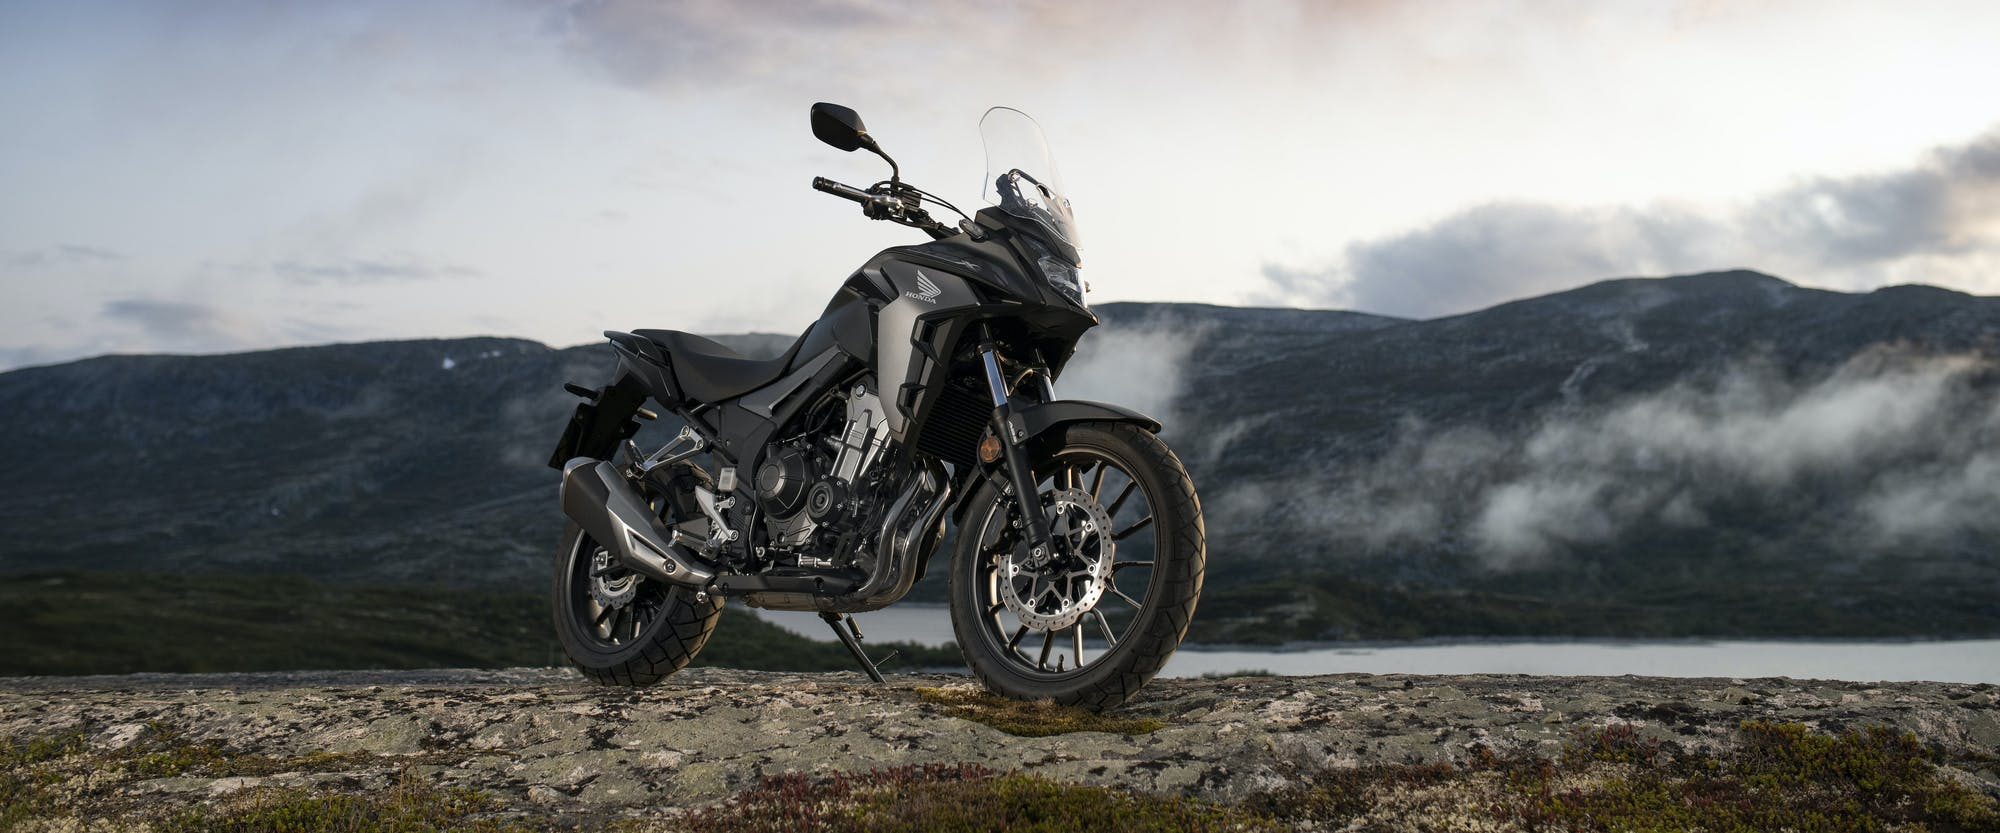 Honda CB500X in Matte Gunpowder Black Metallic colour, parked on off-road track